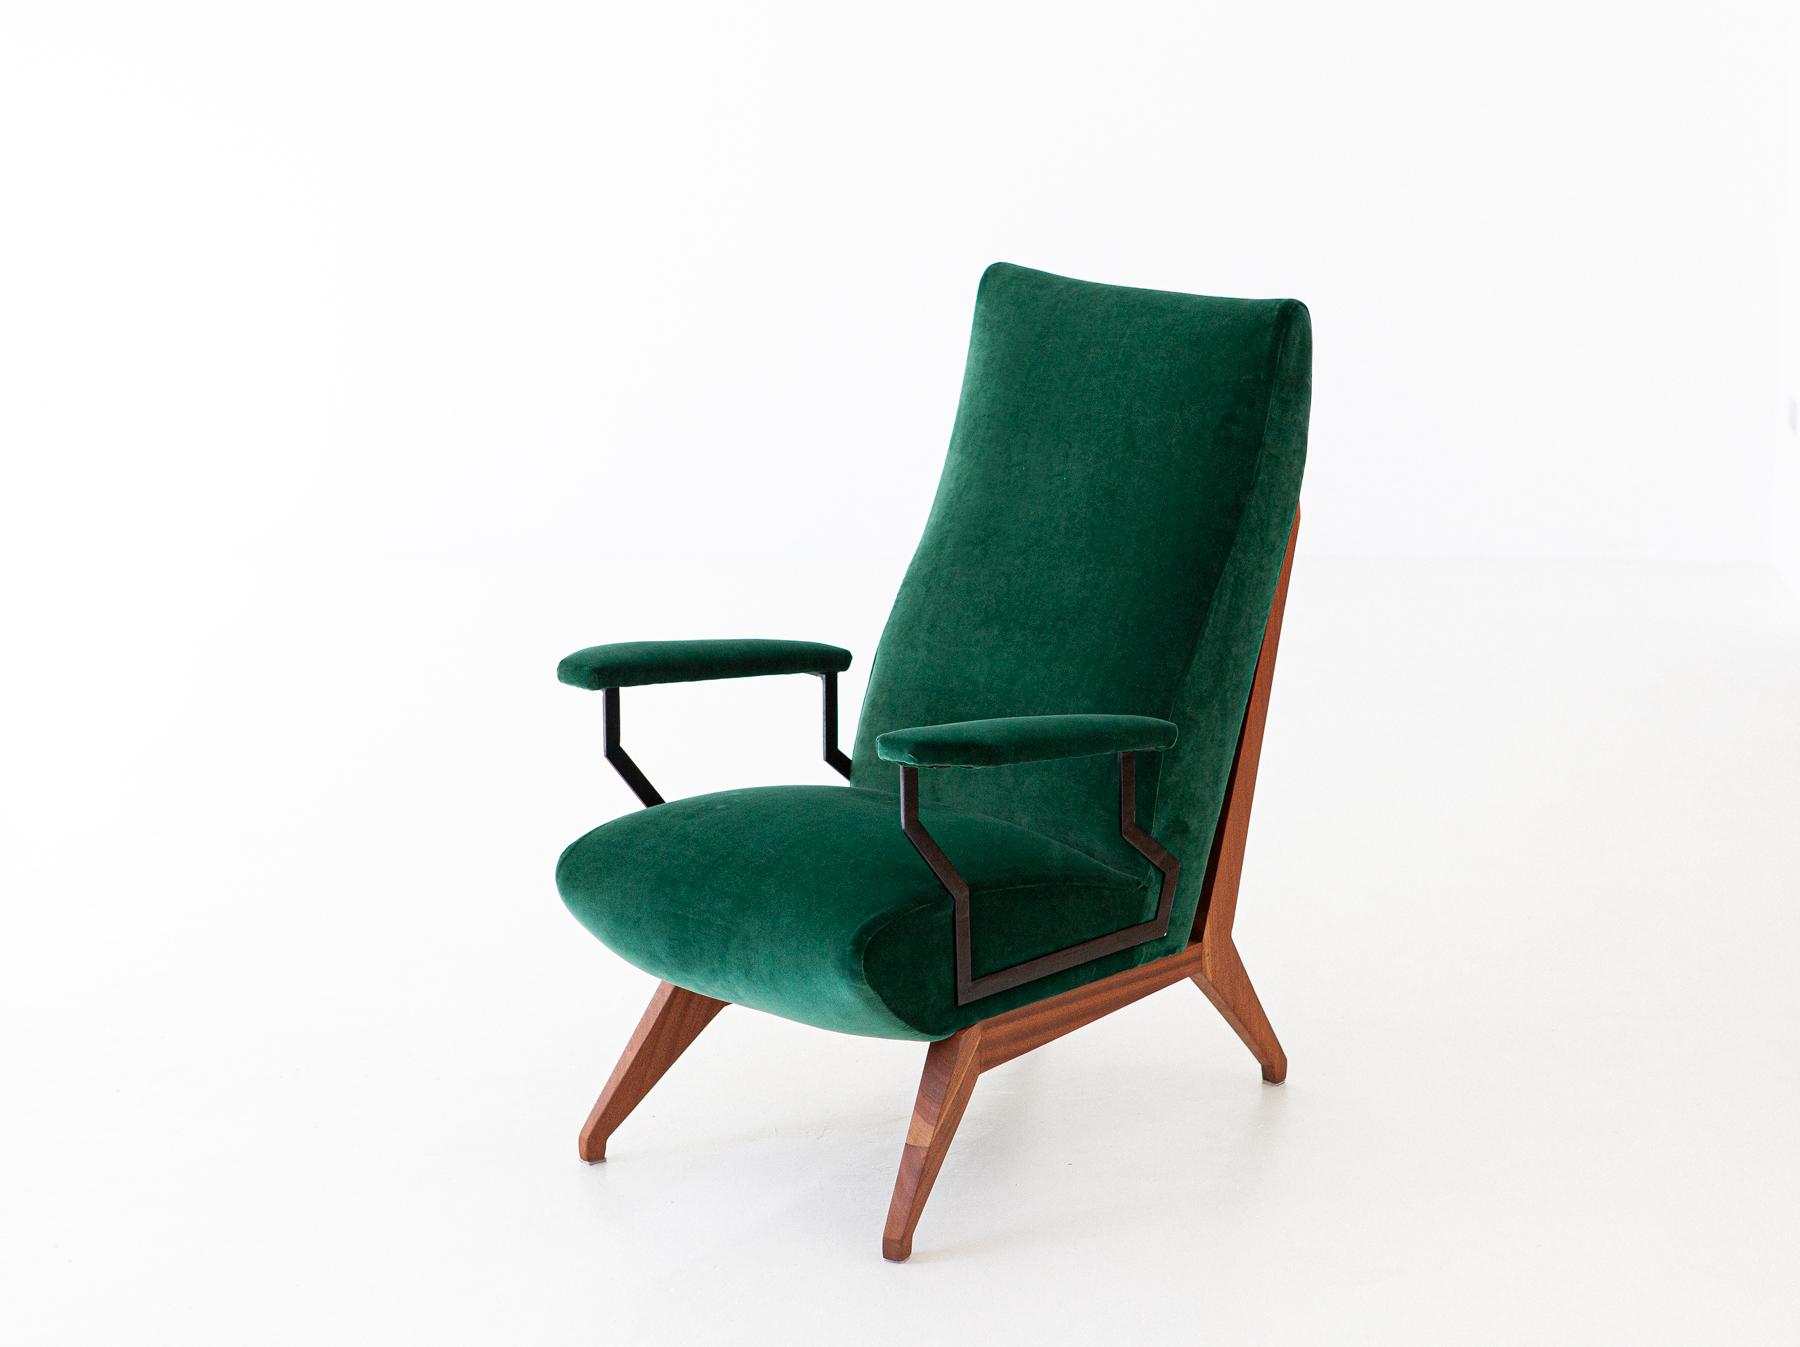 1950s-green-velvet-mahogany-italian-armchair-1-se290